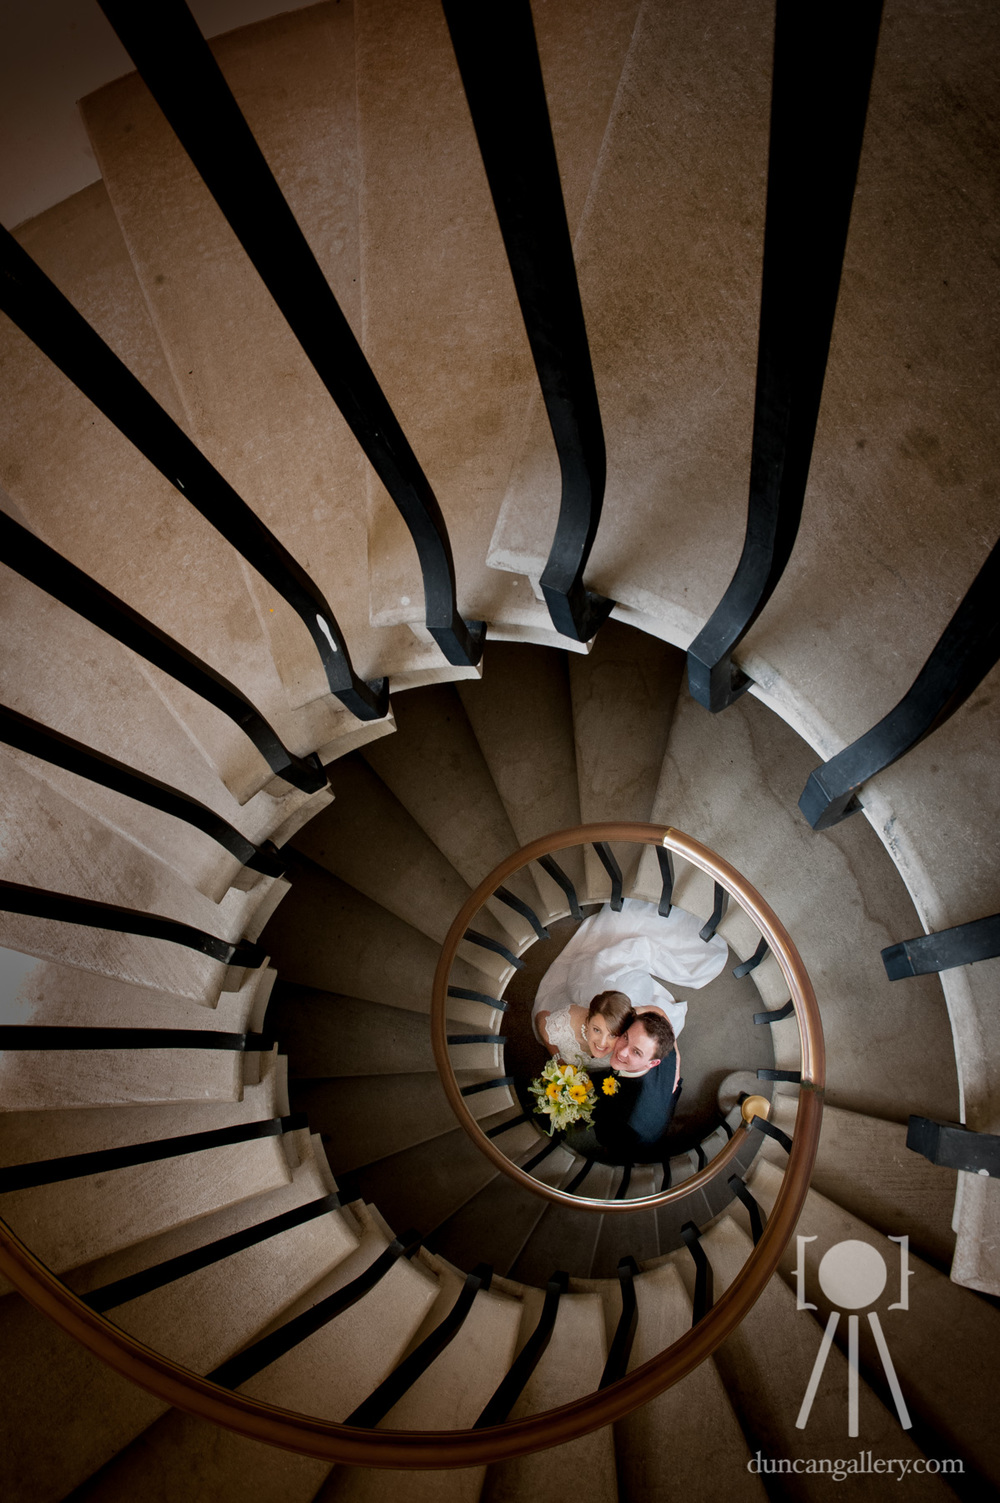 Bride U0026 Groom In Spiral Staircase   Missouri Wedding Photography